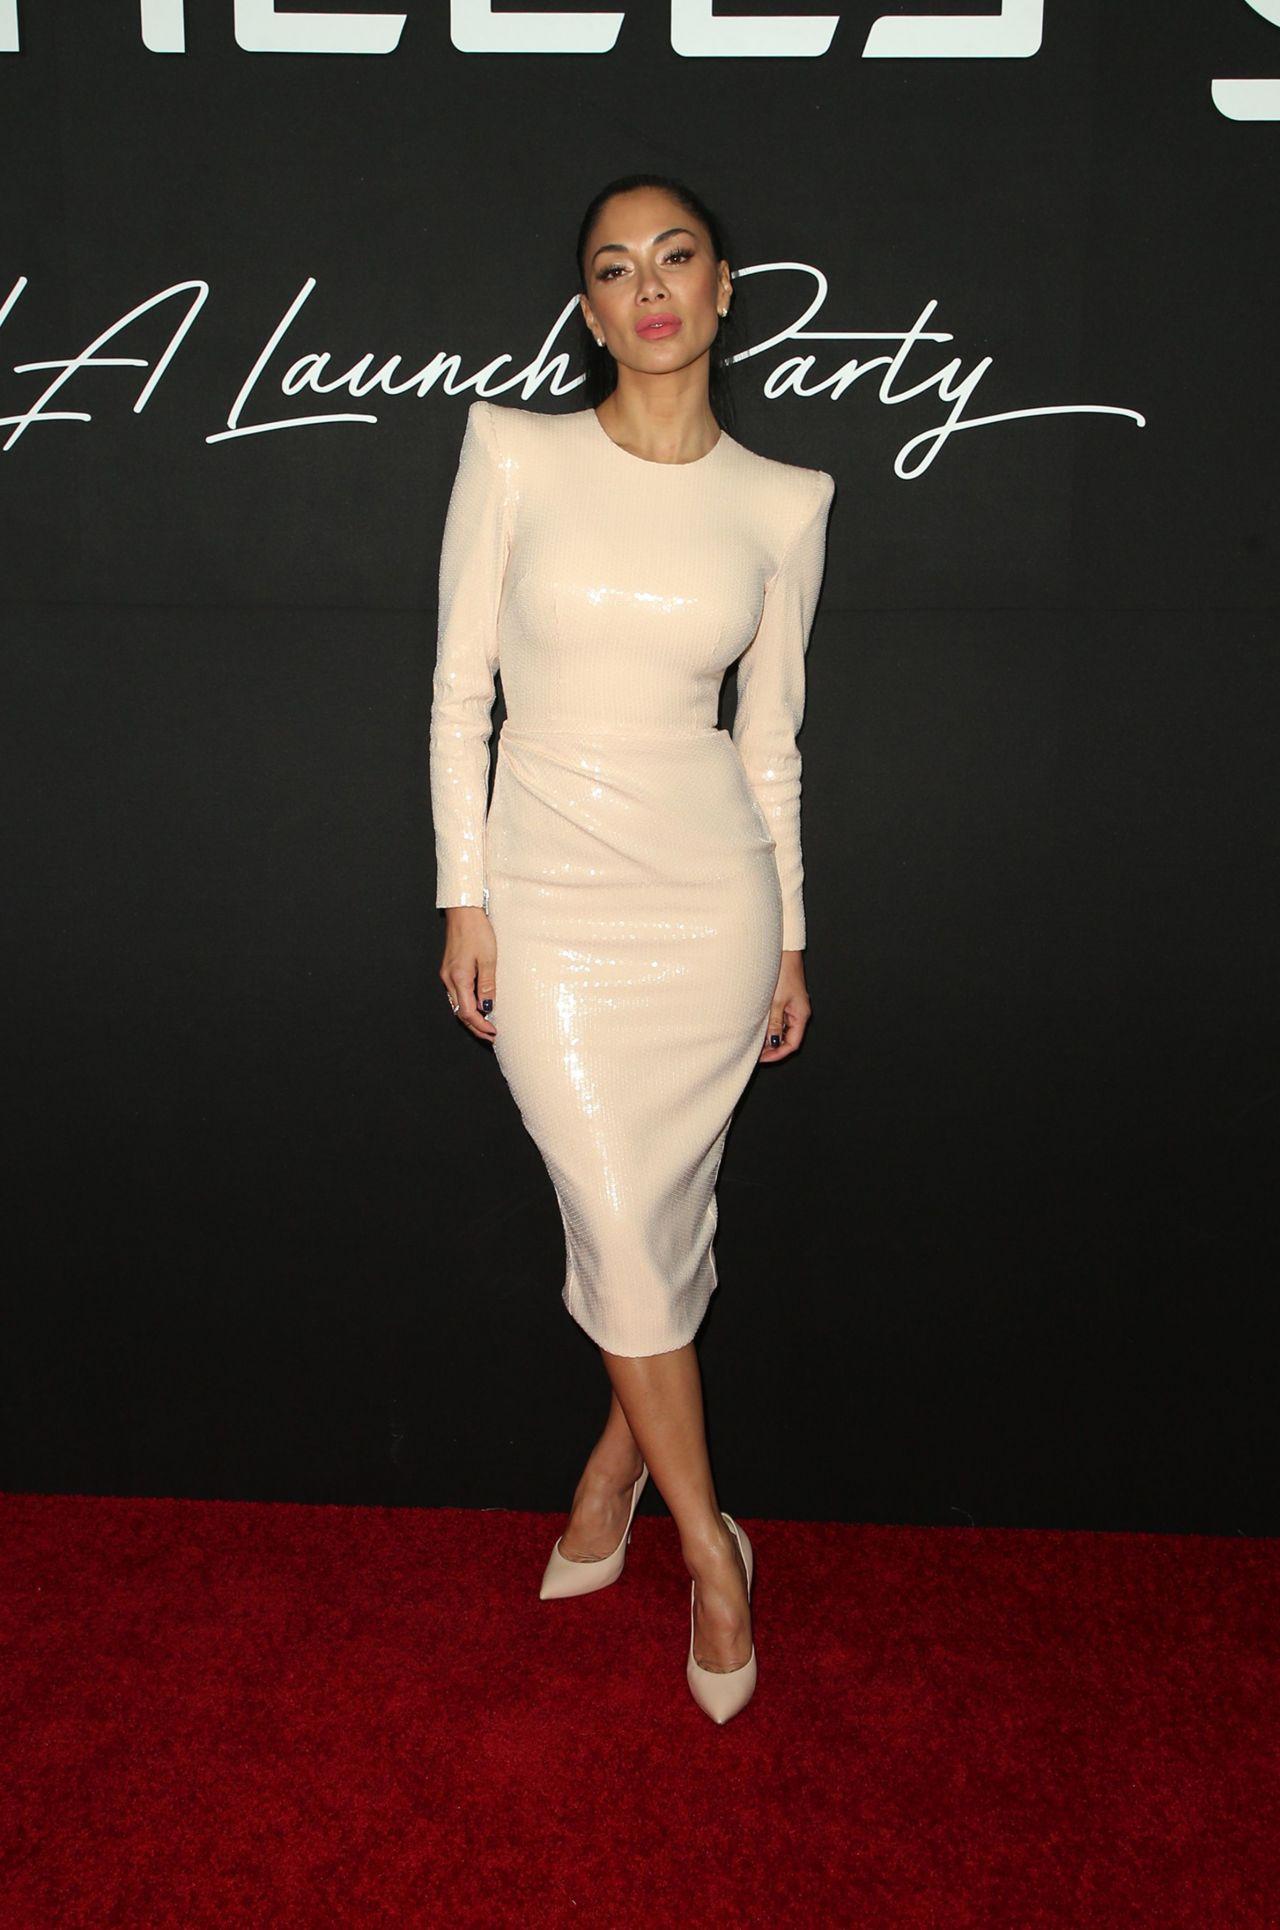 Nicole Scherzinger Wheels Launch Party In La 3 14 2019